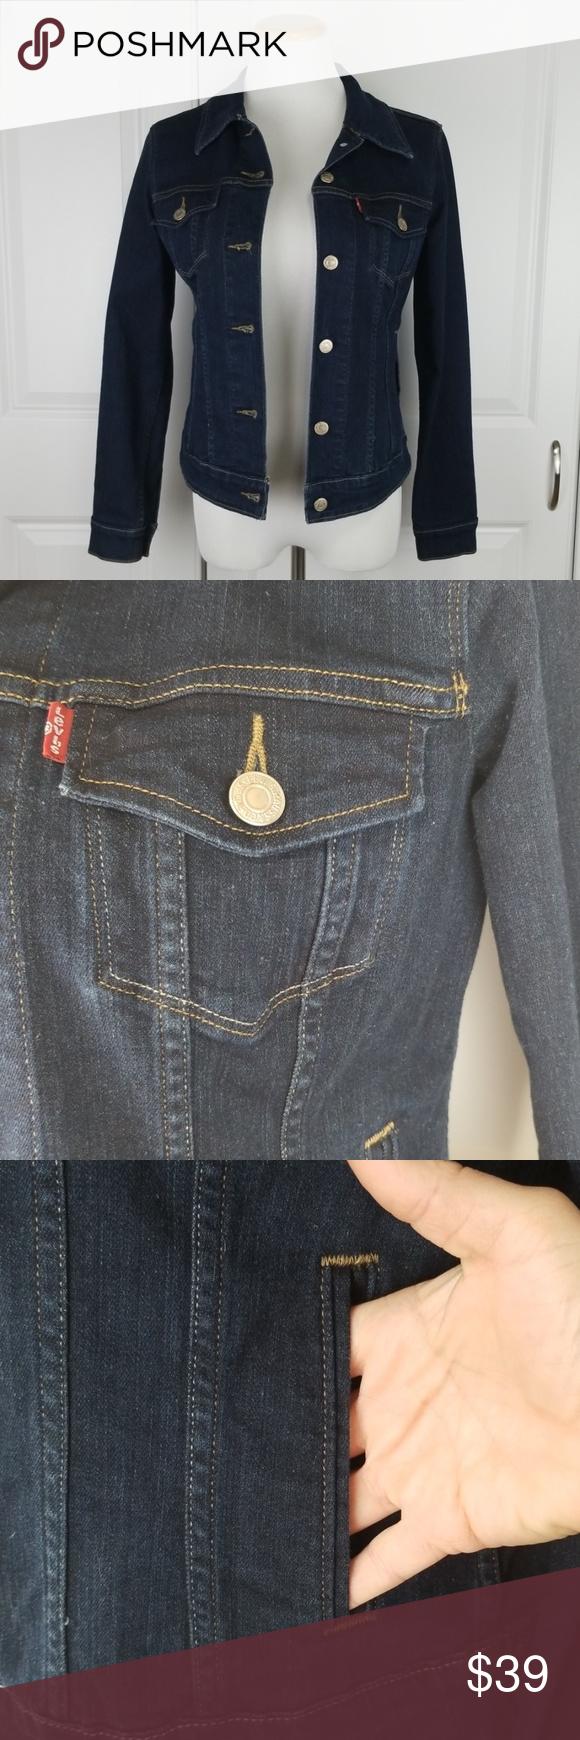 Levi S Dark Denim Jean Jacket Coat Levis Blue Jean Dark Denim Denim Jean Jacket Dark Denim Jeans [ 1740 x 580 Pixel ]